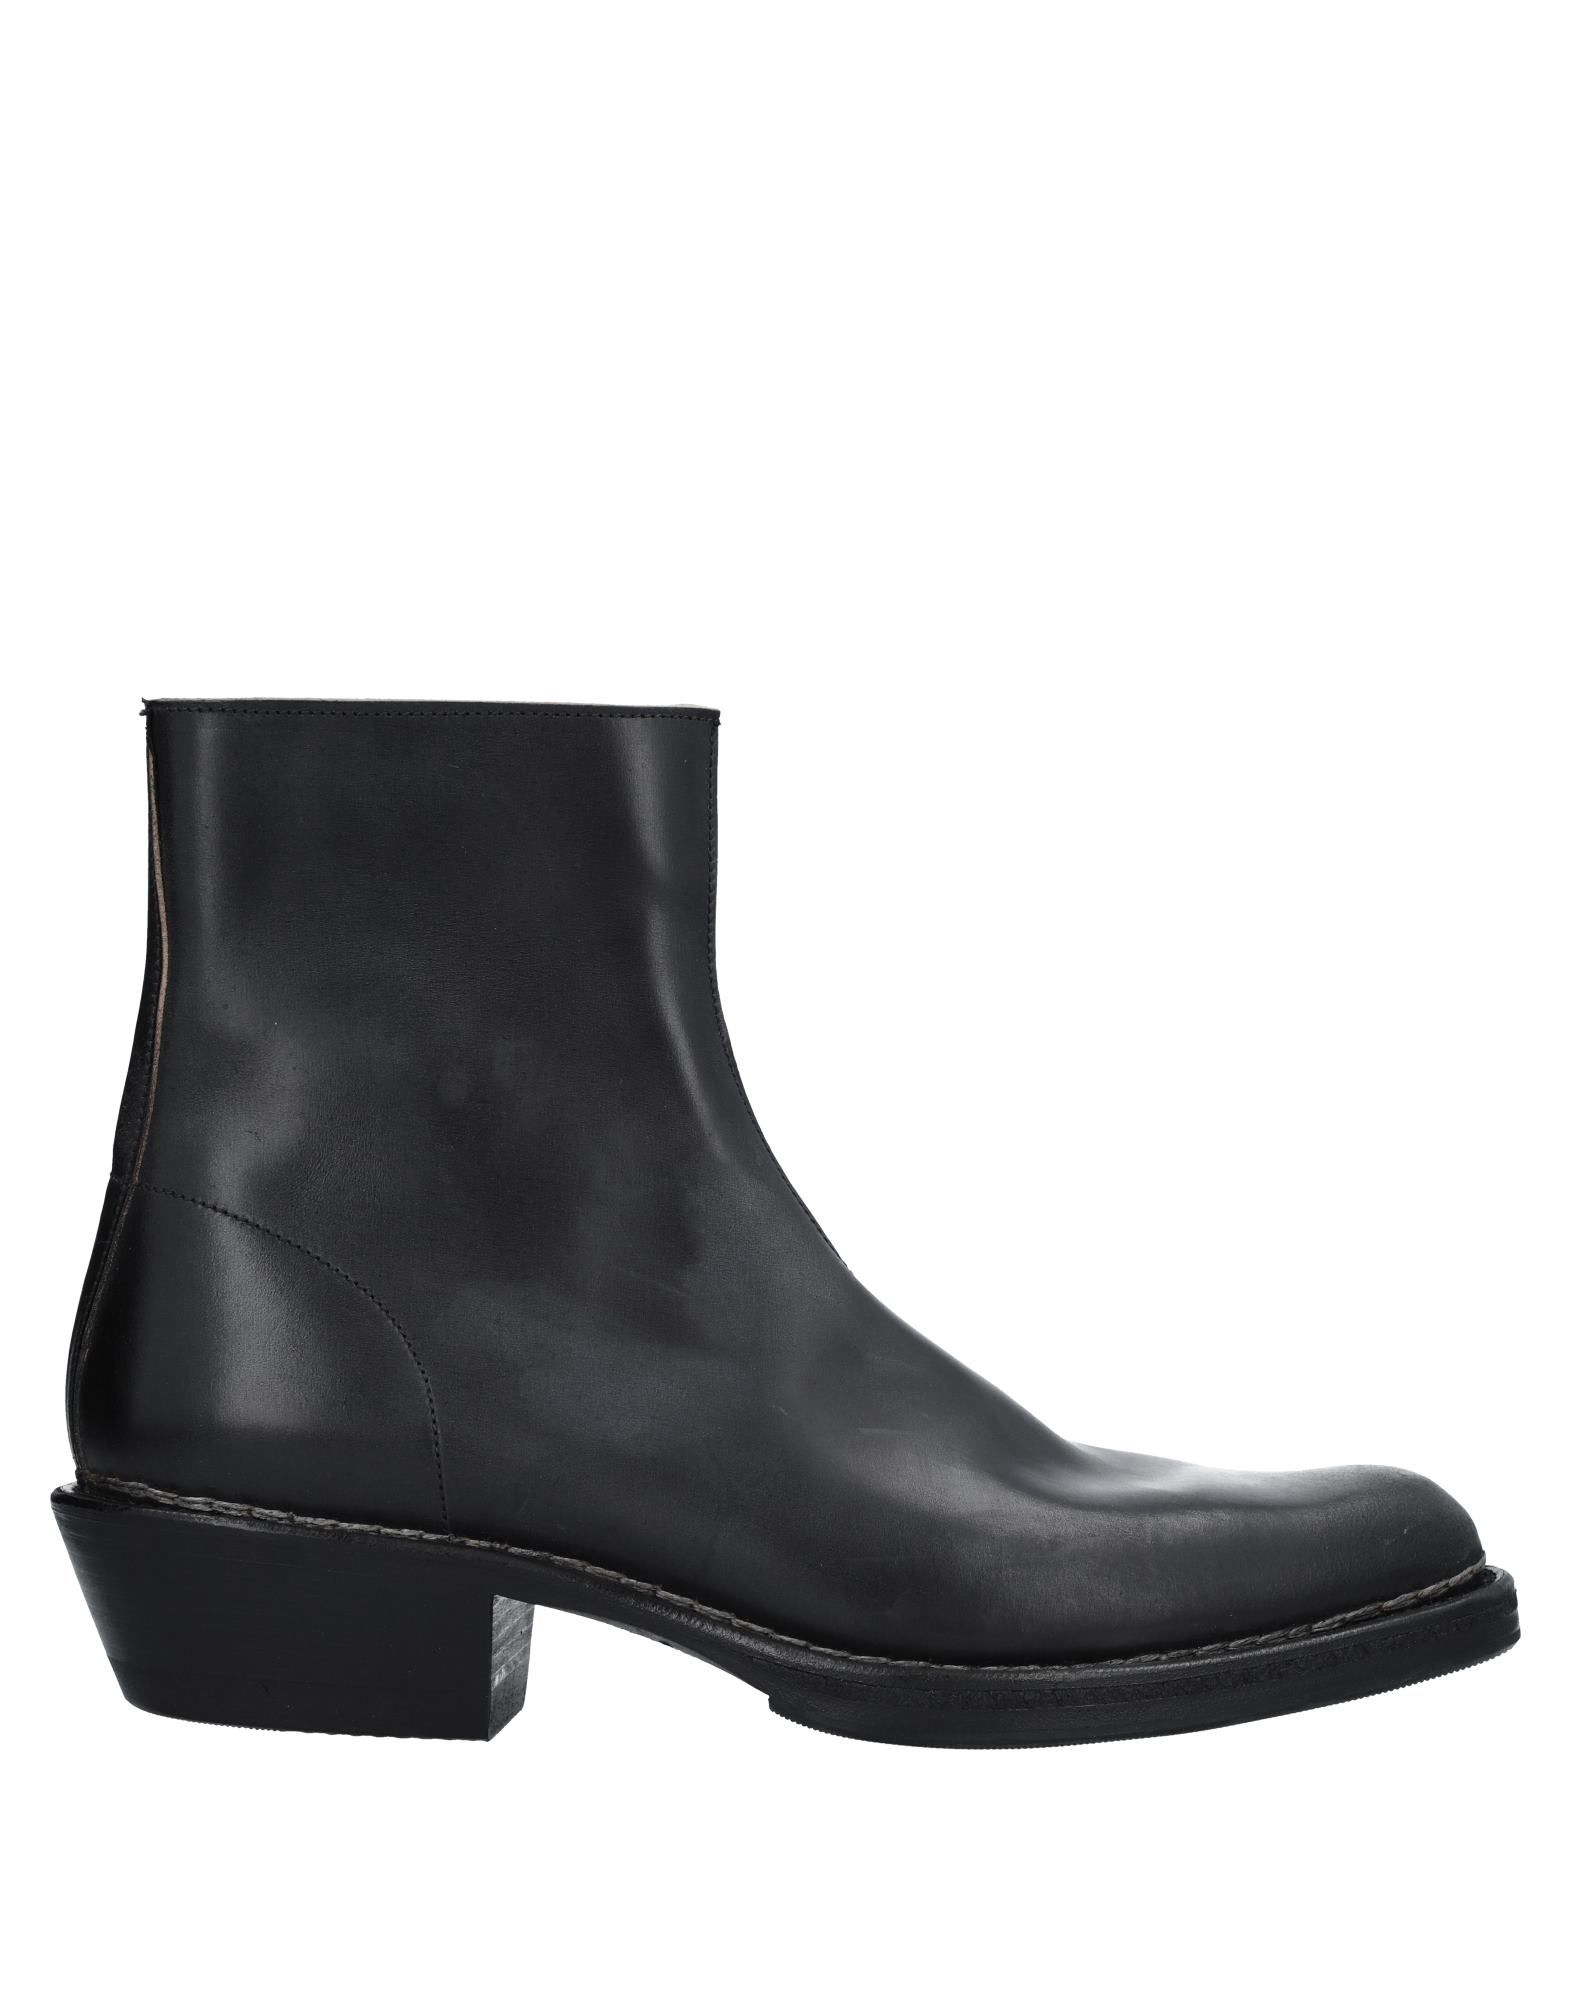 Premiata Boots - Canada Men Premiata Boots online on  Canada - - 11530928RL 64e172